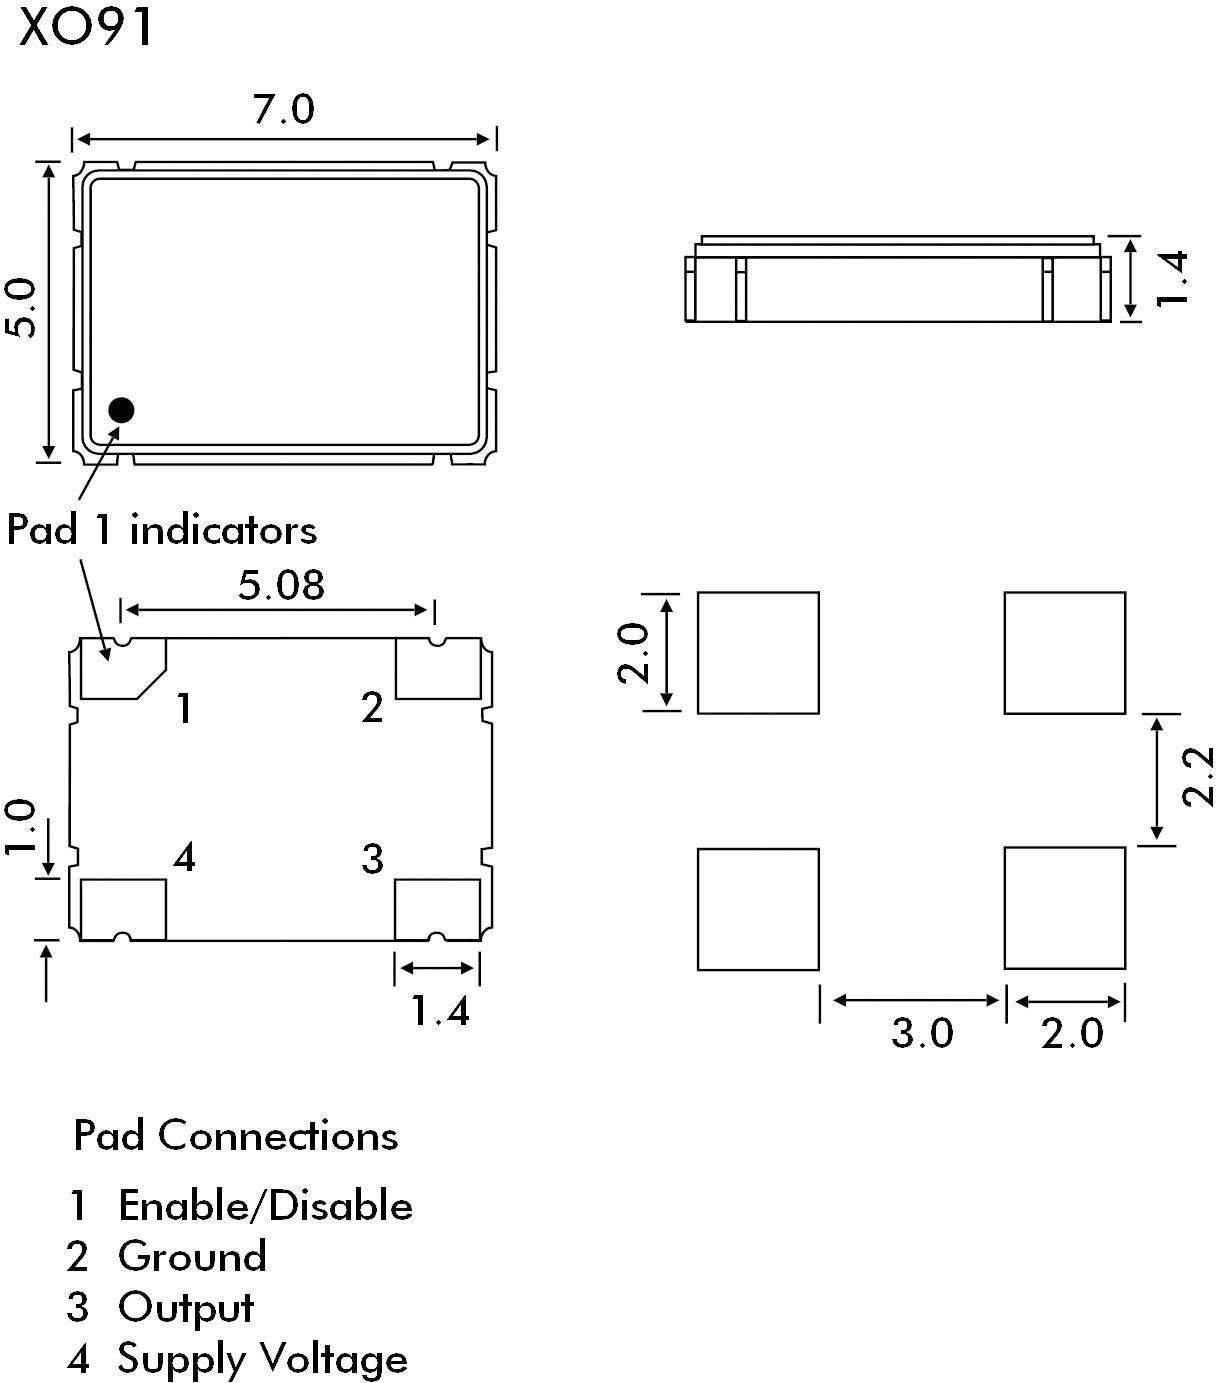 Crystal Oscillator Euroquartz Quarz Smd 5x7 Hcmos 24000 Mhz 7 Mm 5 14 Quartz Circuit Diagram Xo91 Series